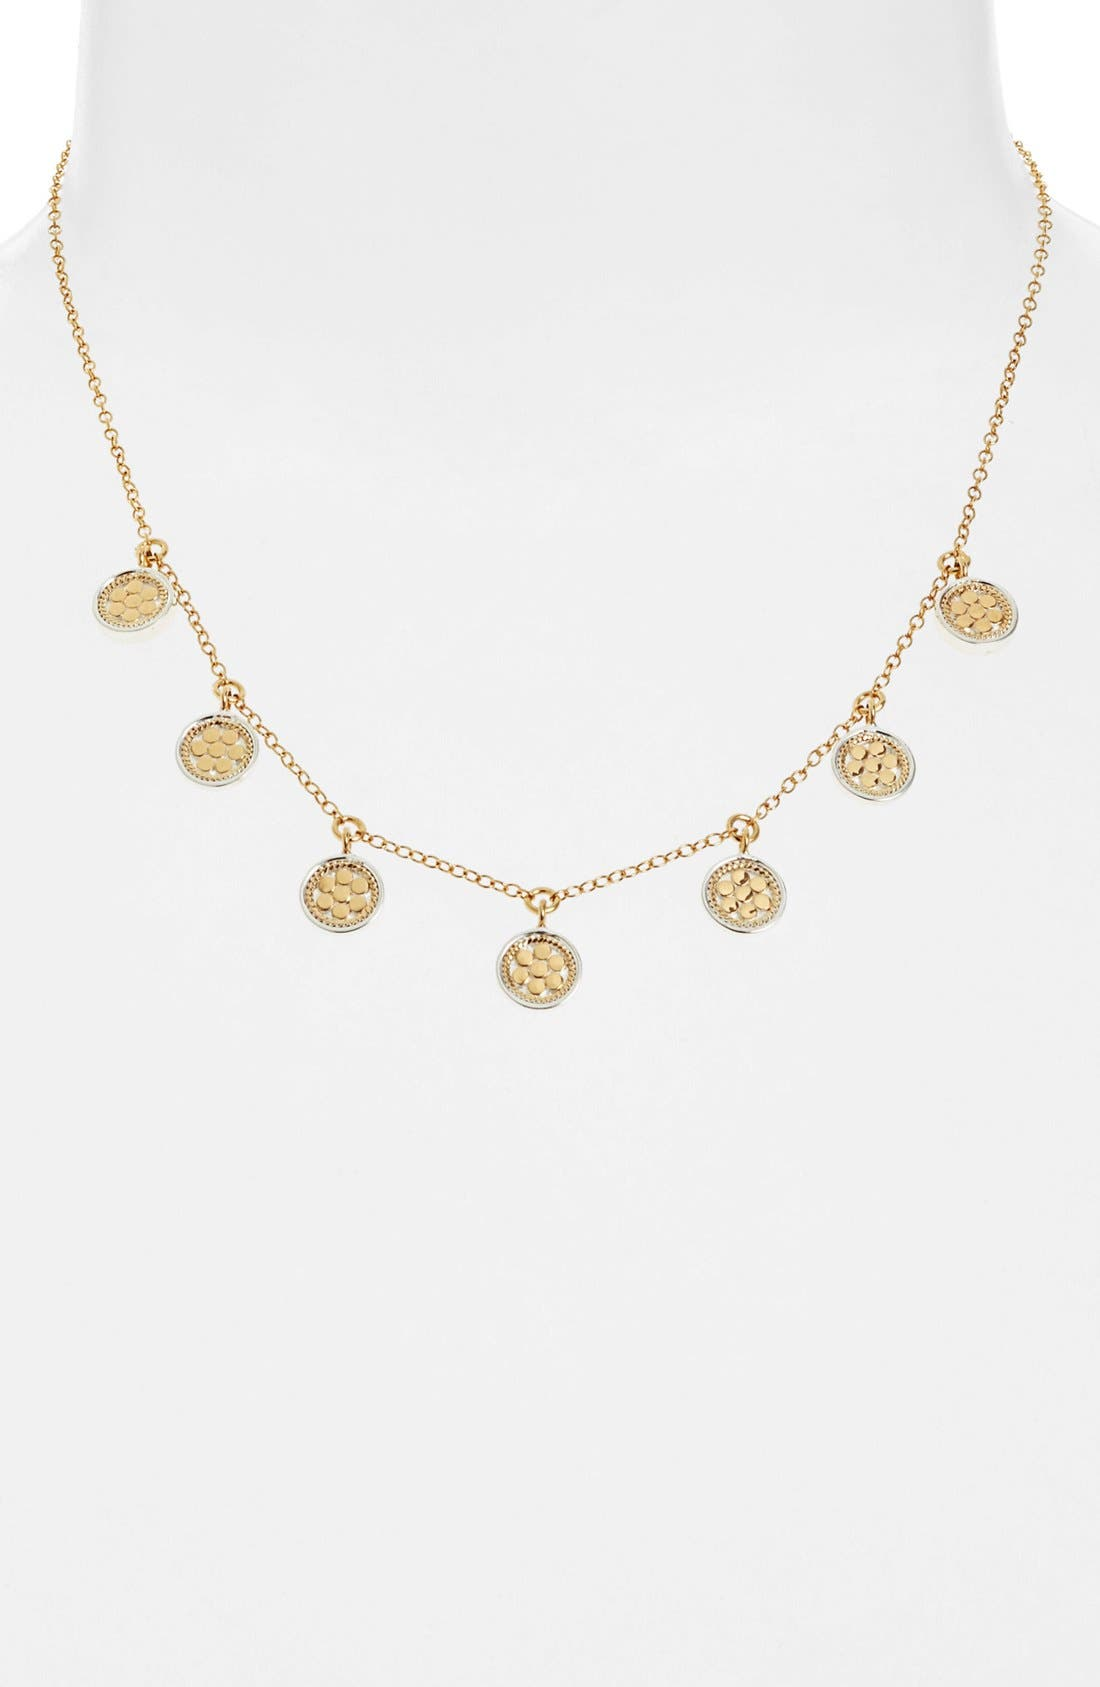 ANNA BECK 'Gili' Charm Necklace